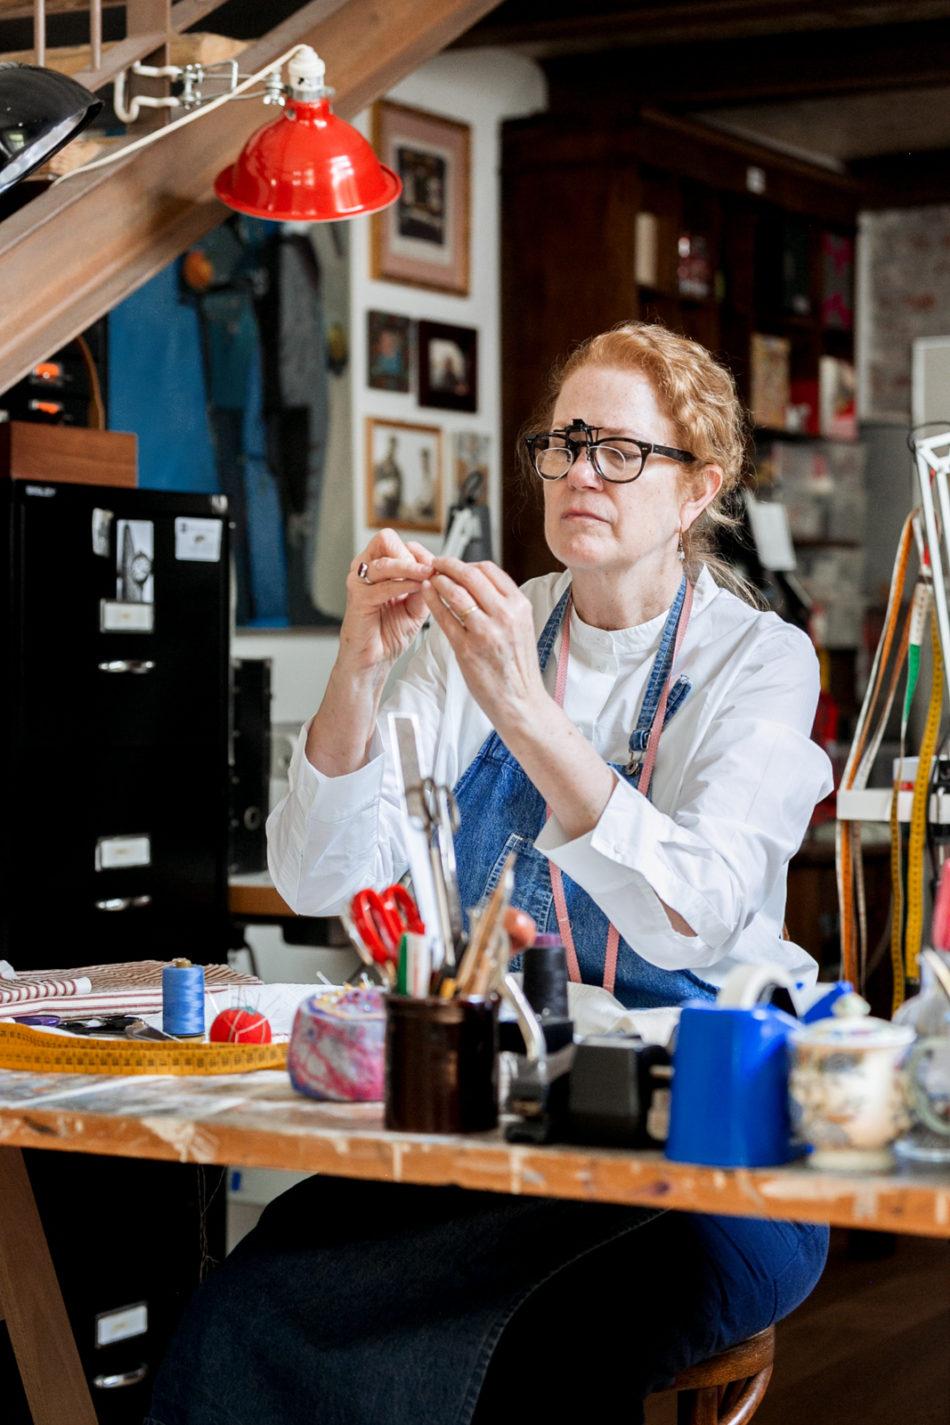 Lis Carpenter at work in her studio